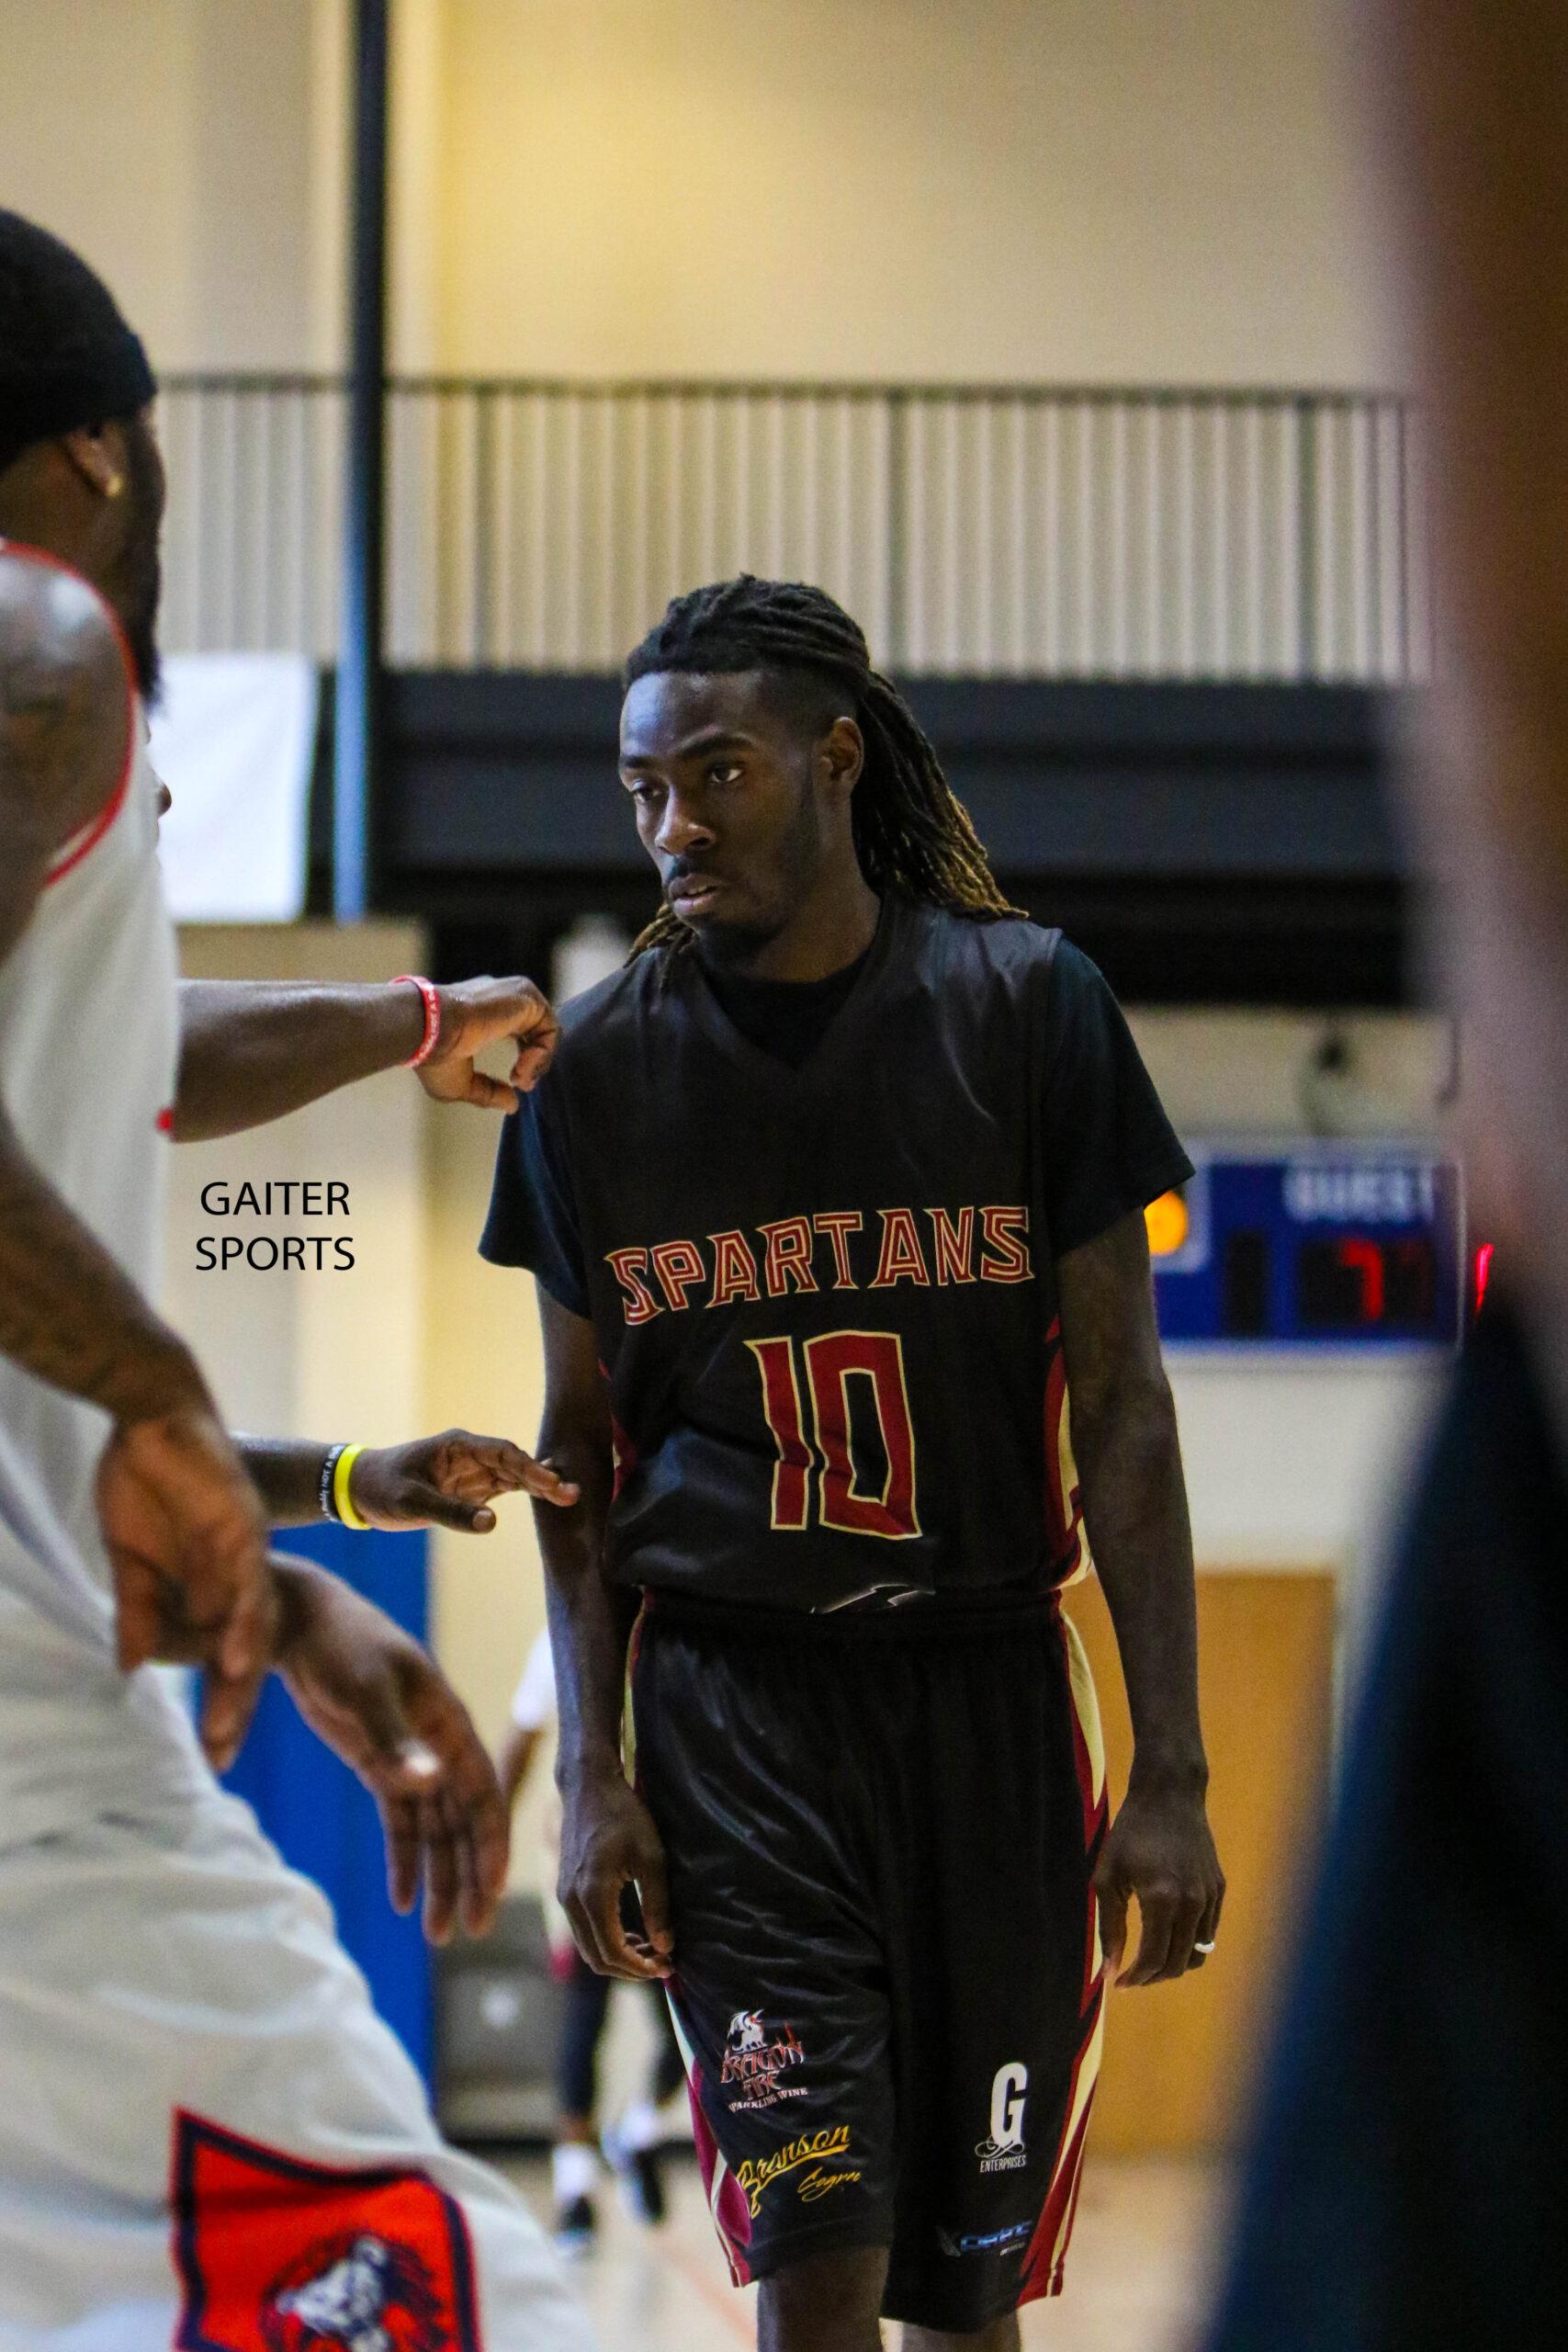 2019 Celebrity Basketball Game Georgia Spartans 14